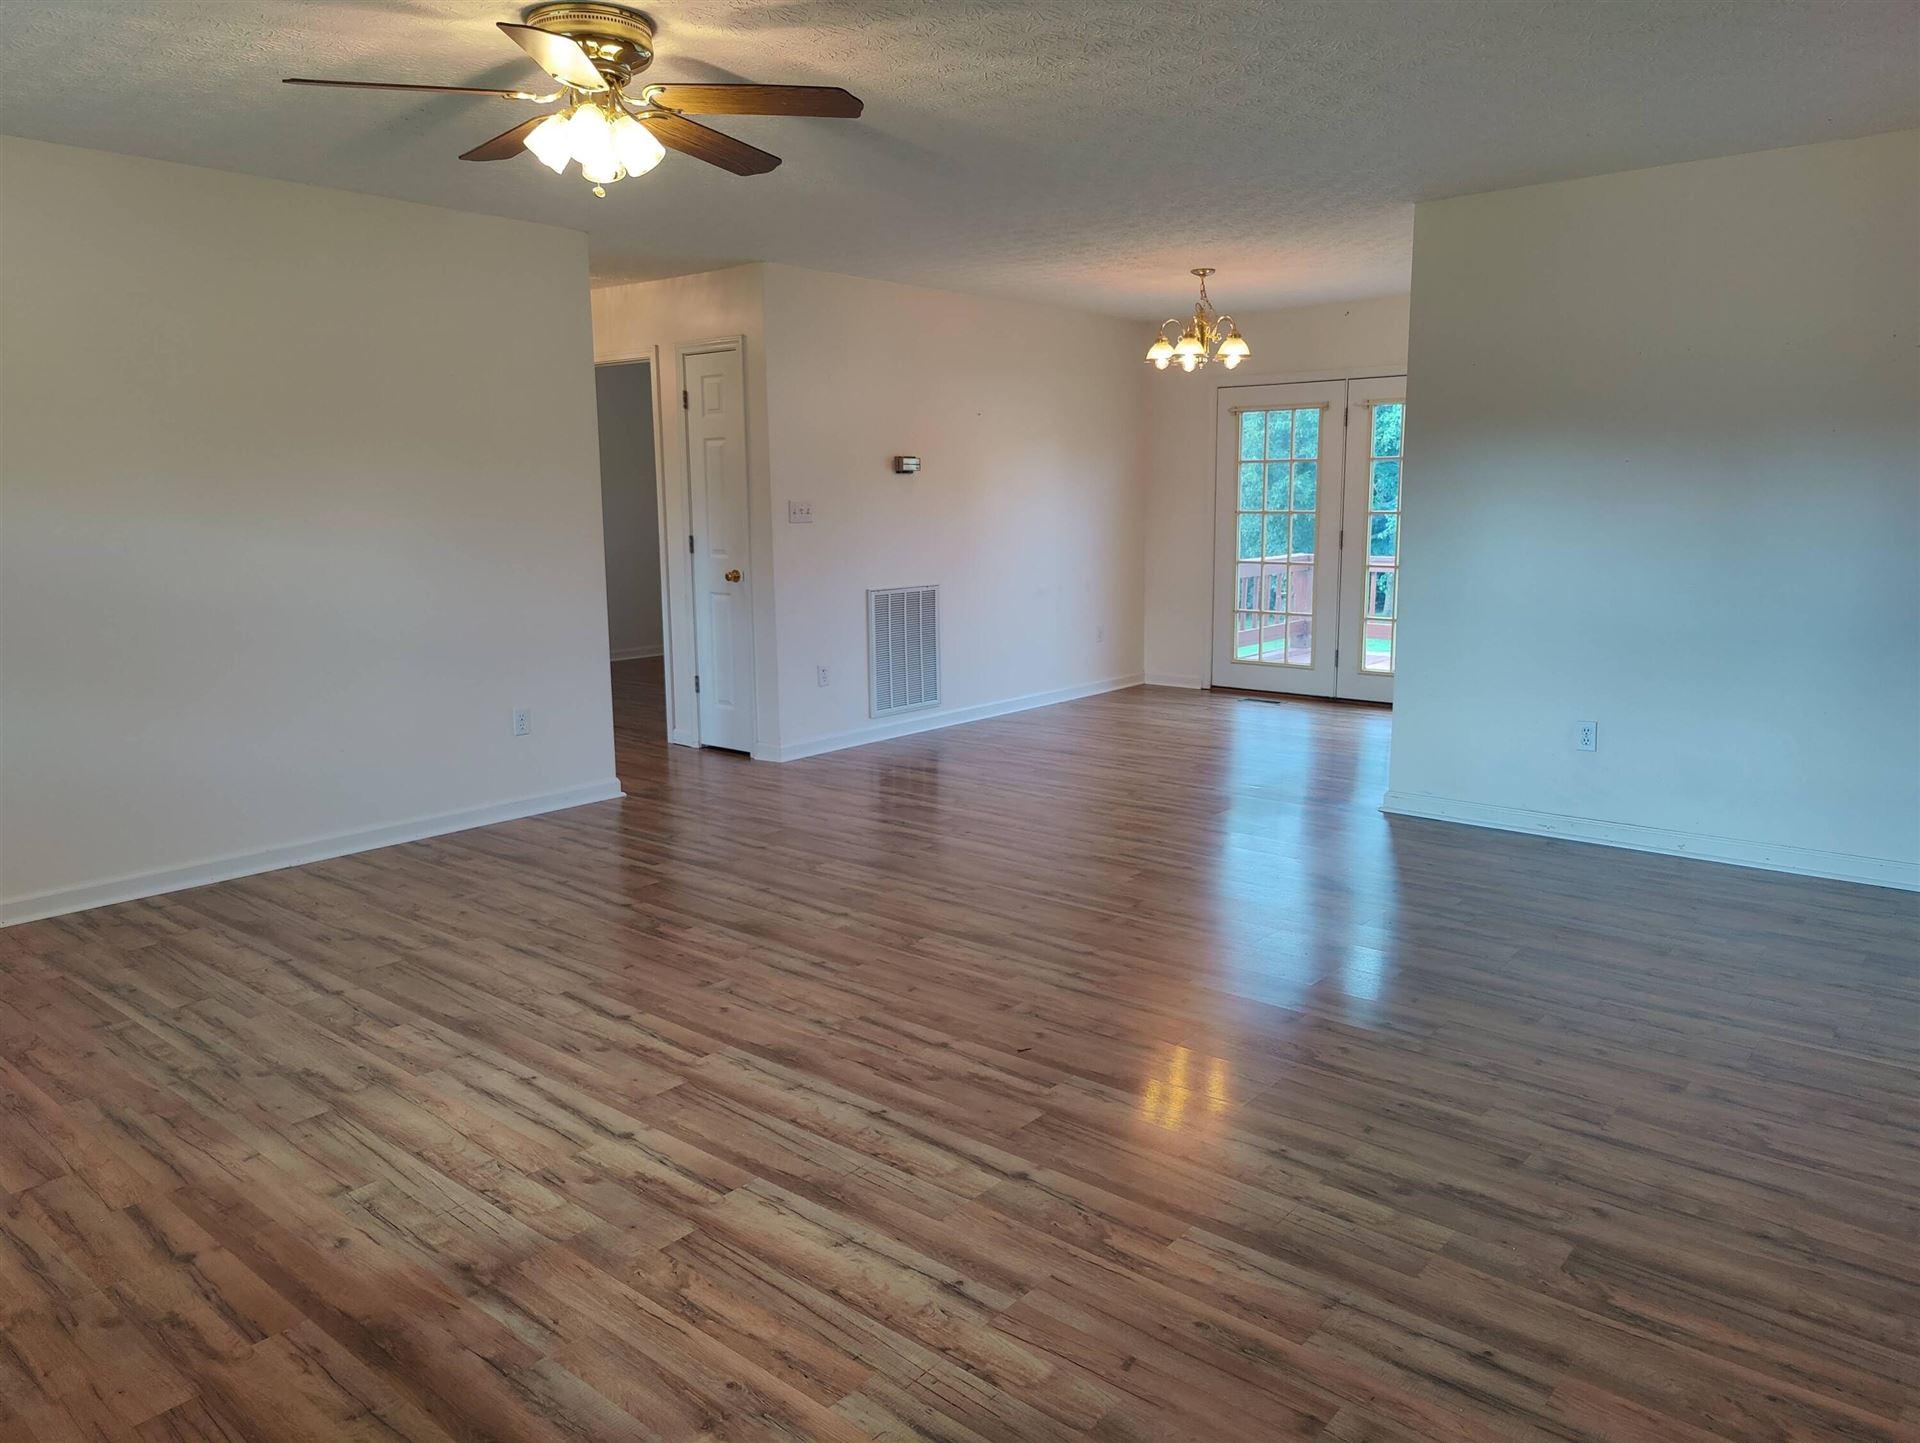 Photo of 425 Ronjo Drive, Maryville, TN 37803 (MLS # 1166537)